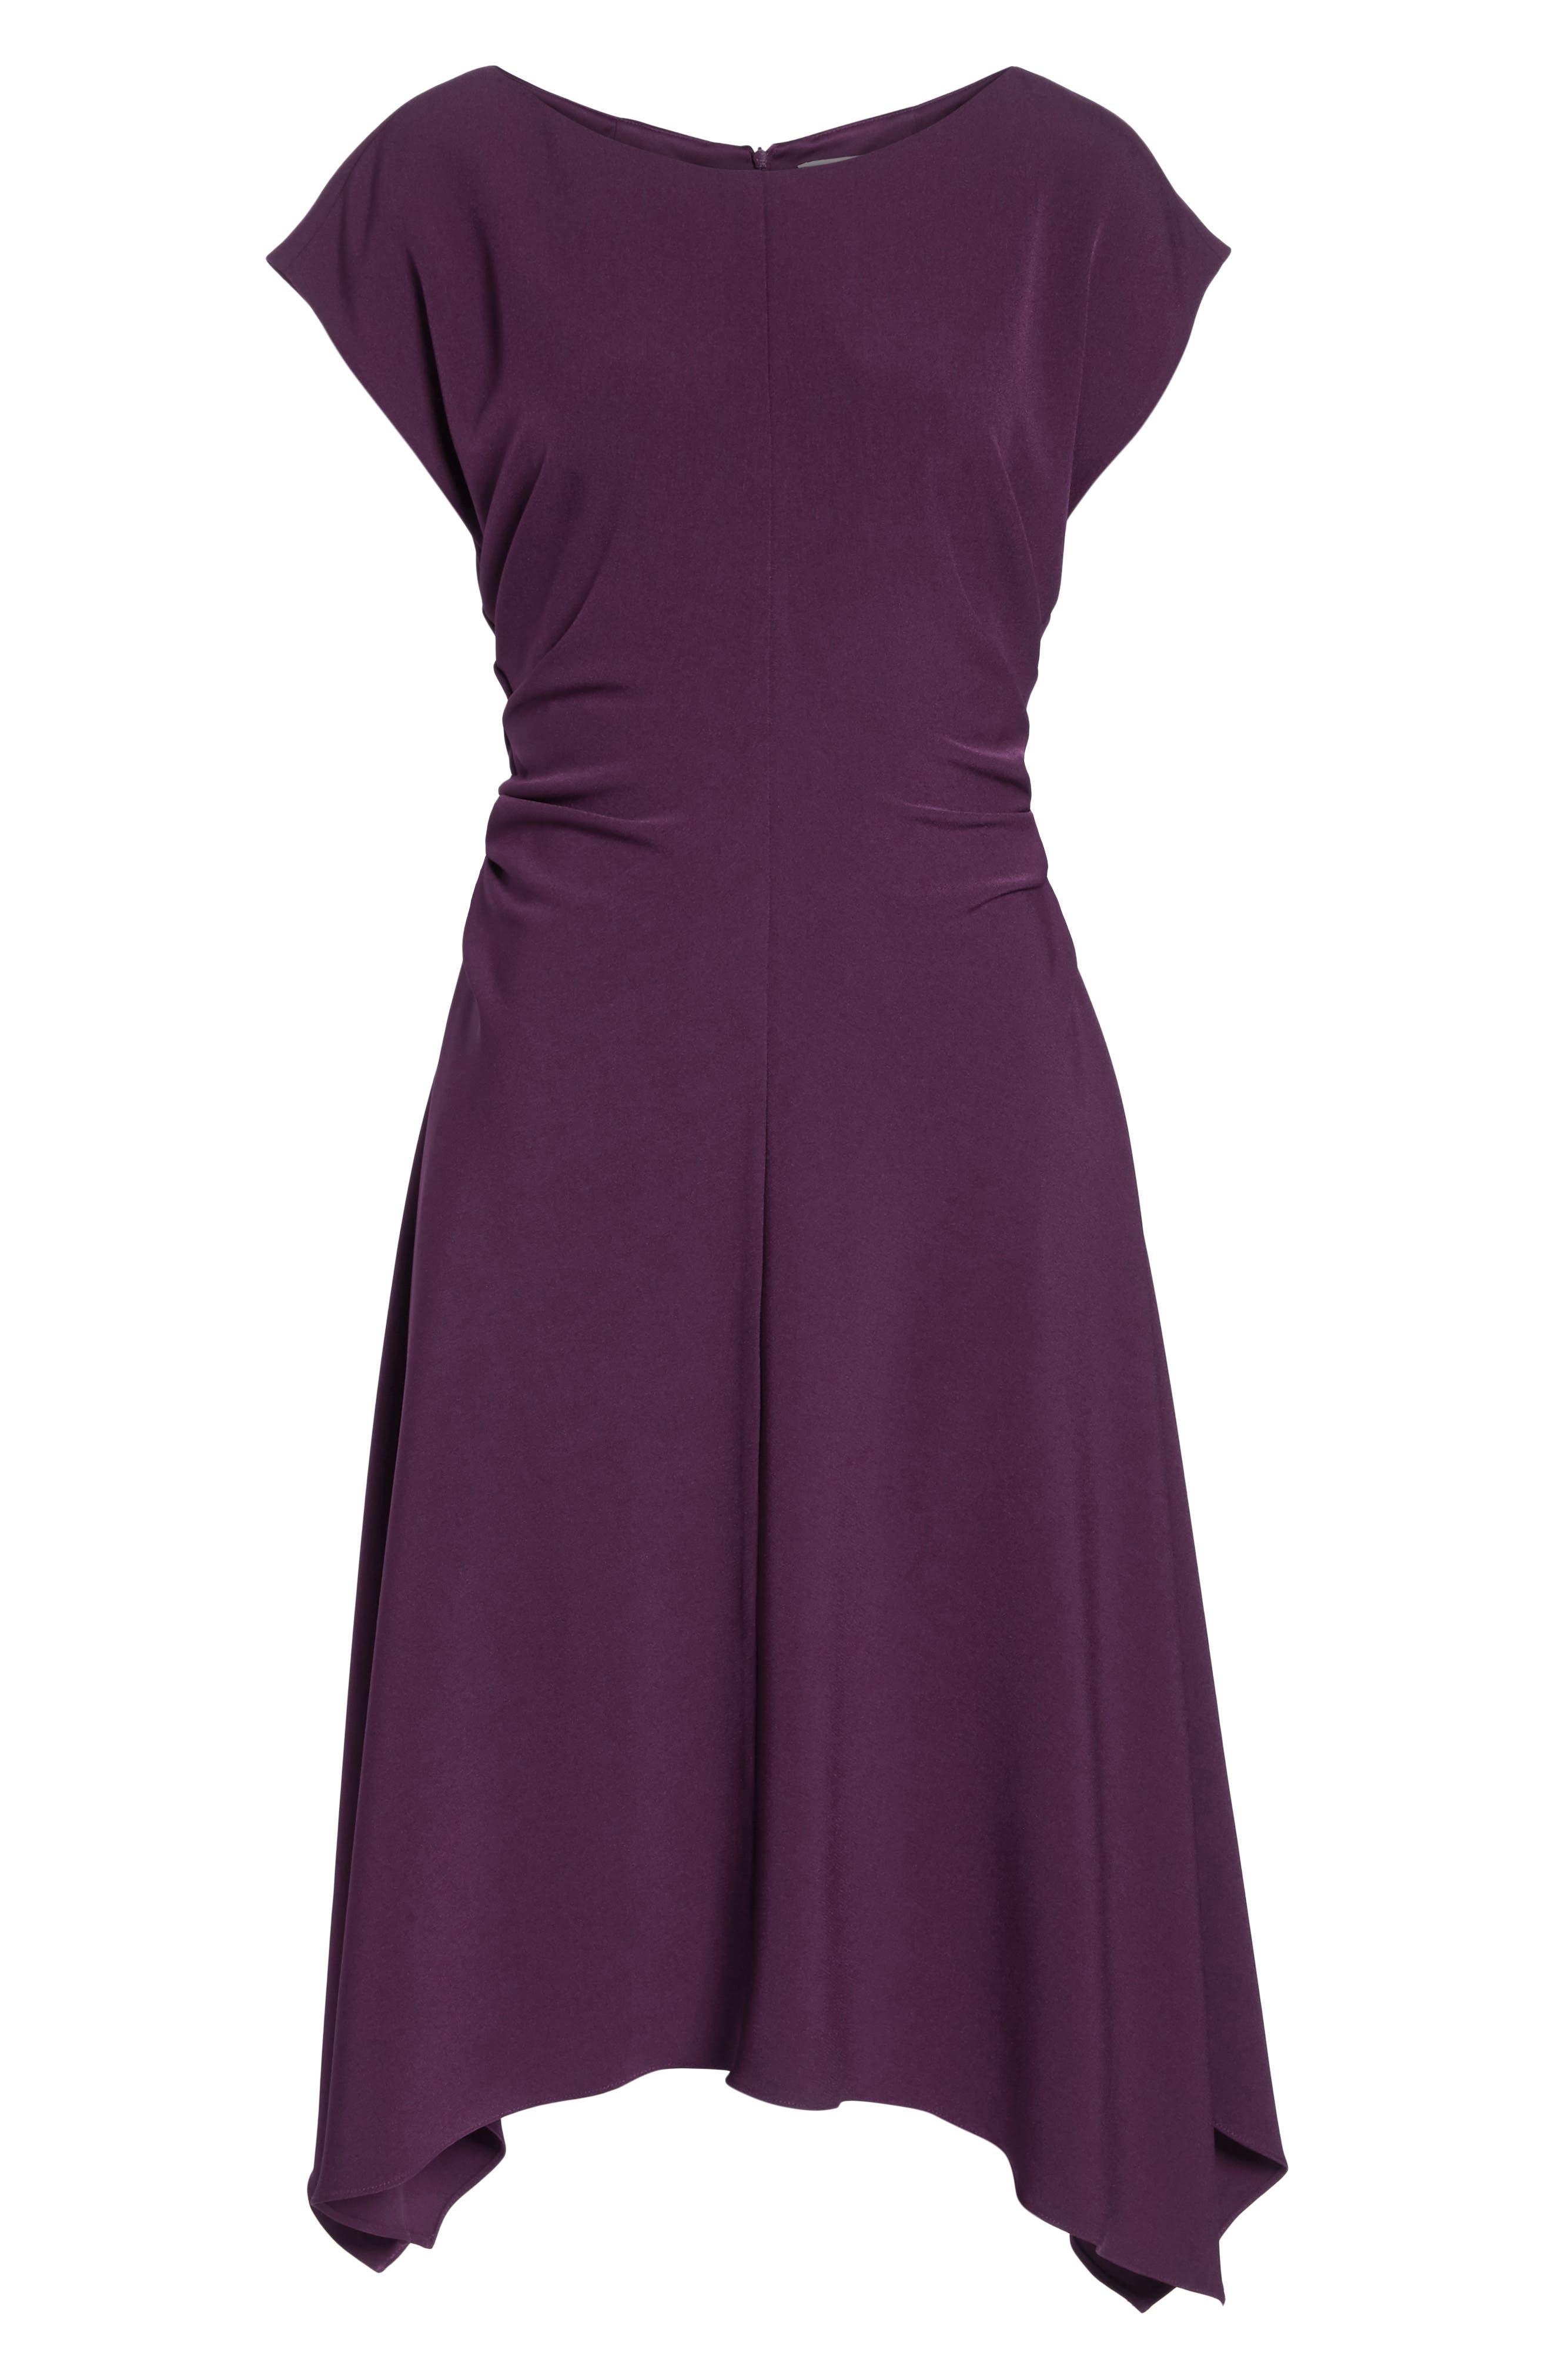 JULIA JORDAN,                             Ruched Stretch Crepe Fit & Flare Dress,                             Alternate thumbnail 8, color,                             PLUM